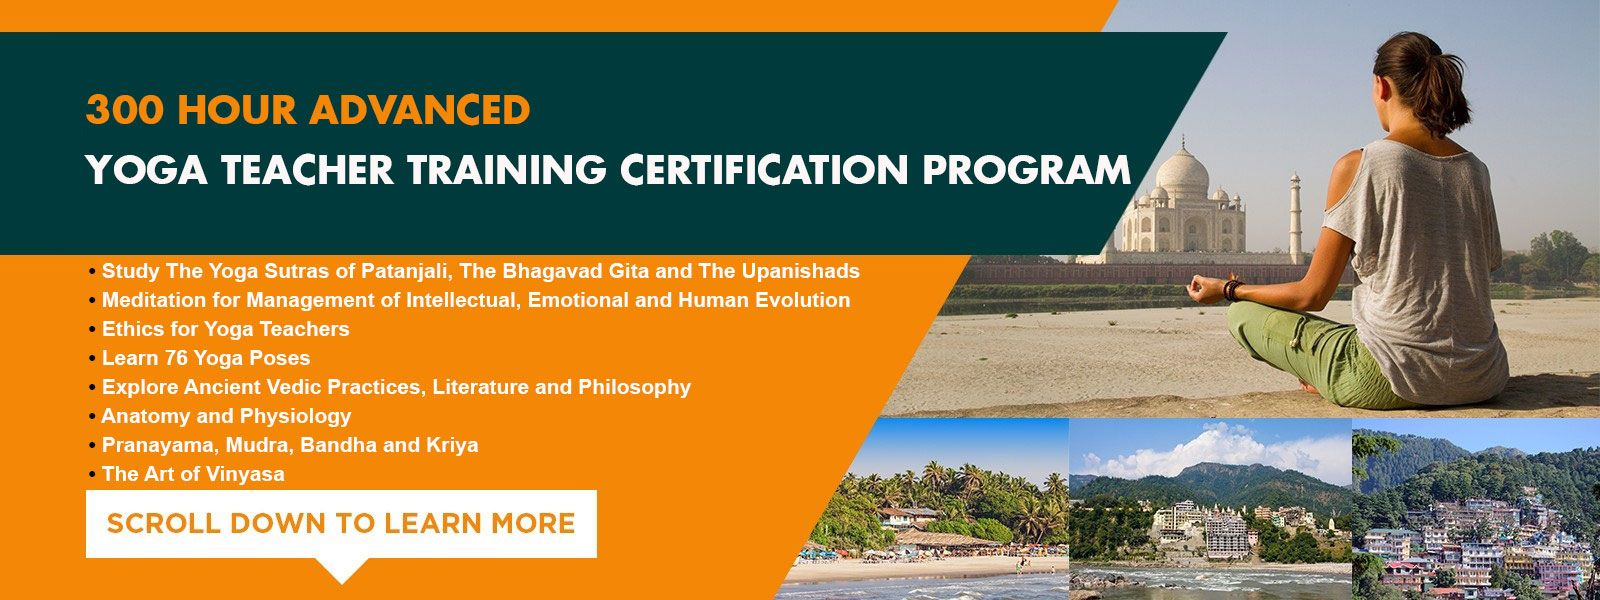 300 Hour Advanced Yoga Teacher Training Certification